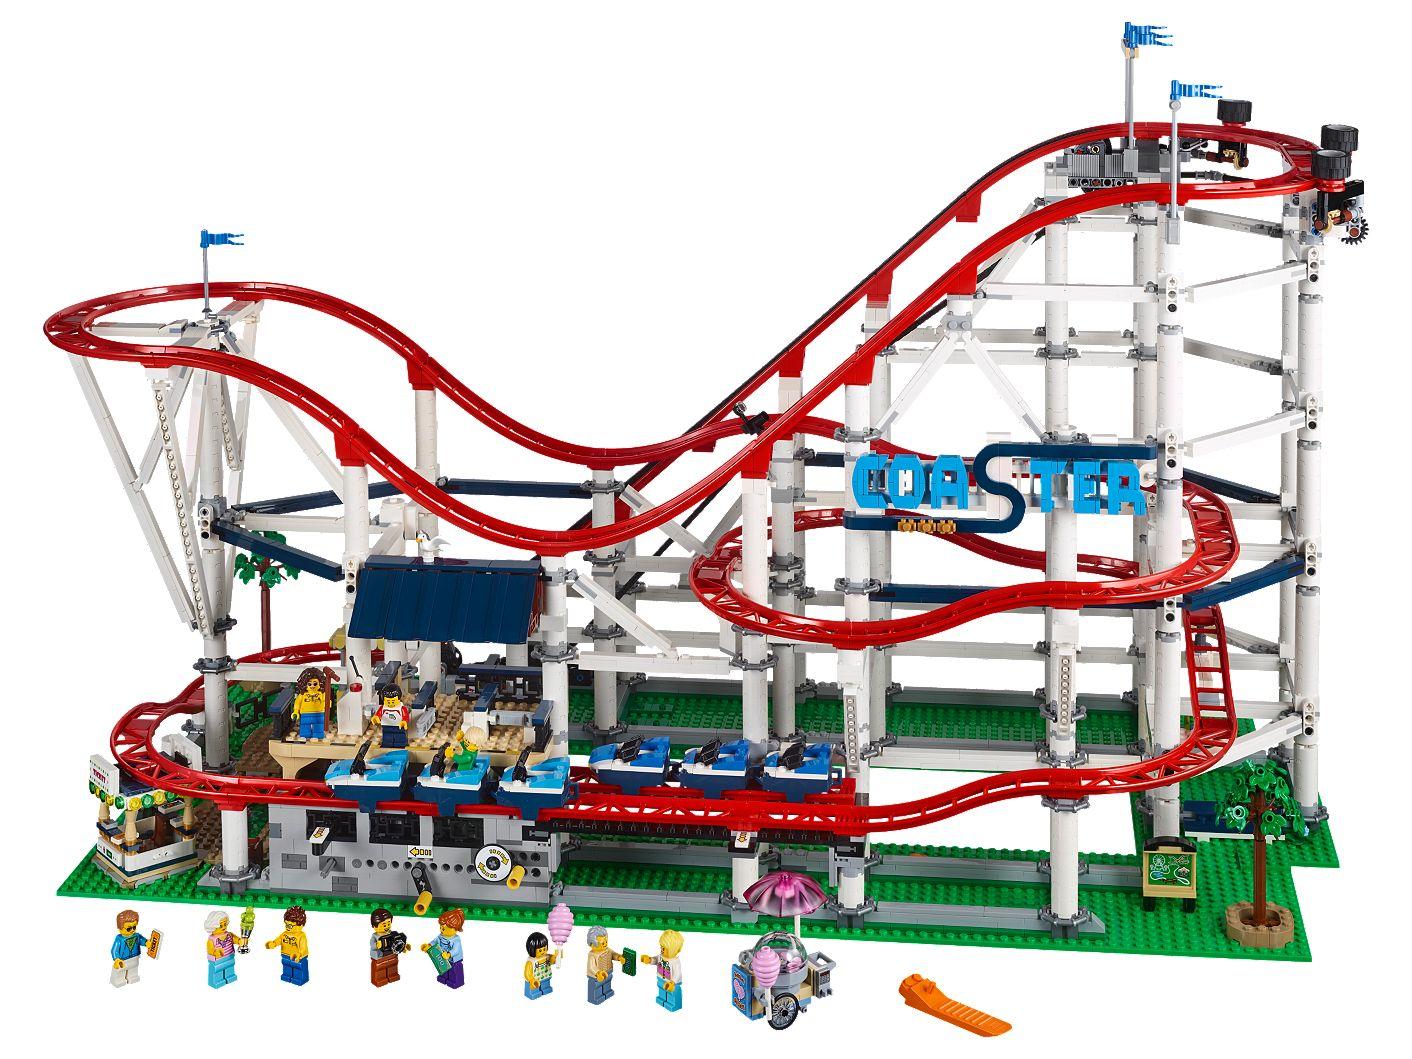 Roller Coaster 10261 | Creator Expert | Buy online at the Official LEGO®  Shop LT